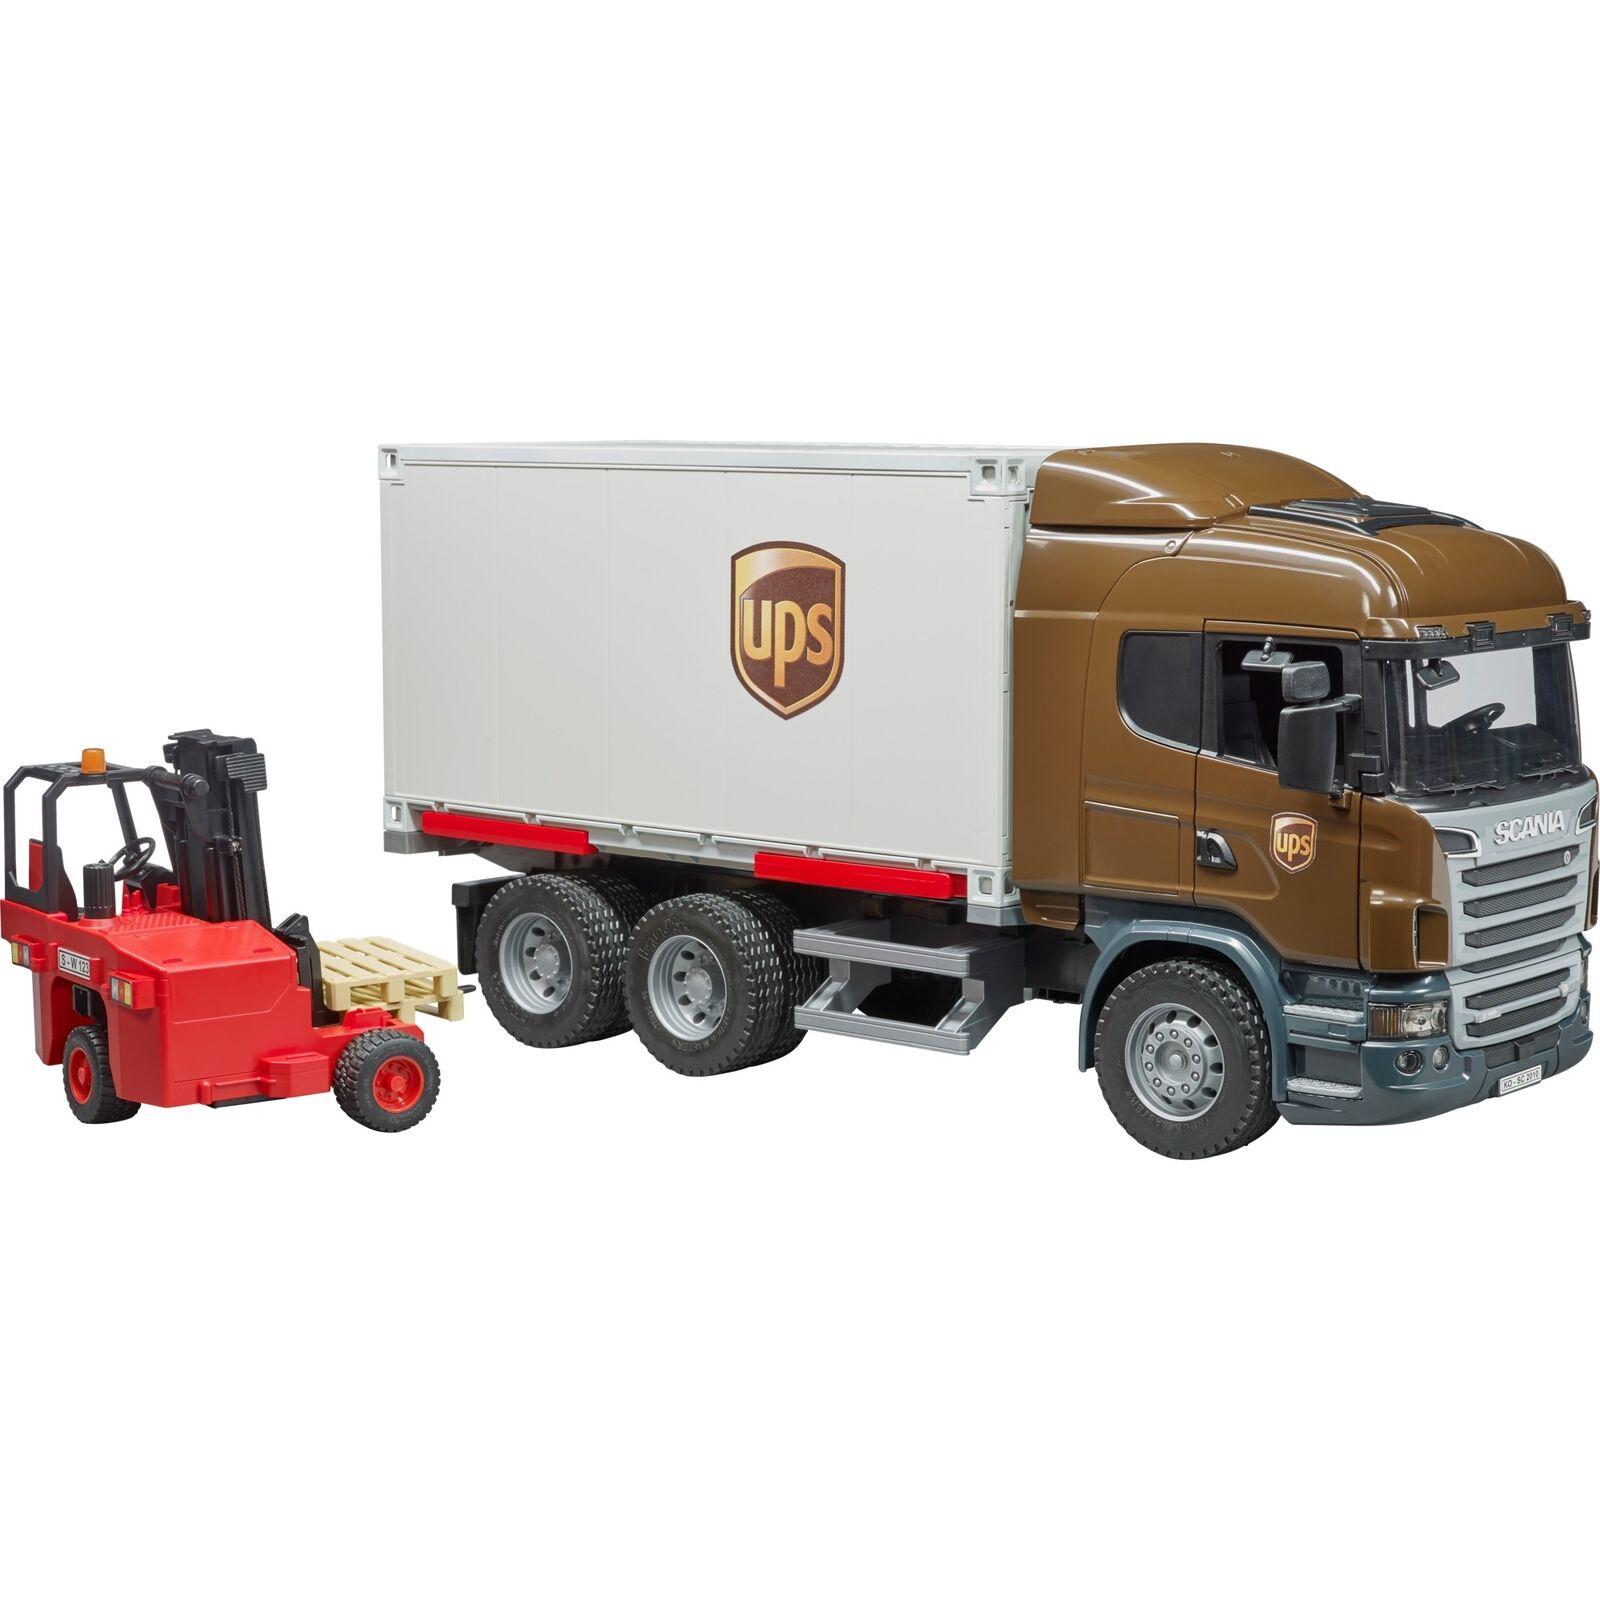 Bruder Scania R-Serie UPS Logistik-LKW , Modellfahrzeug